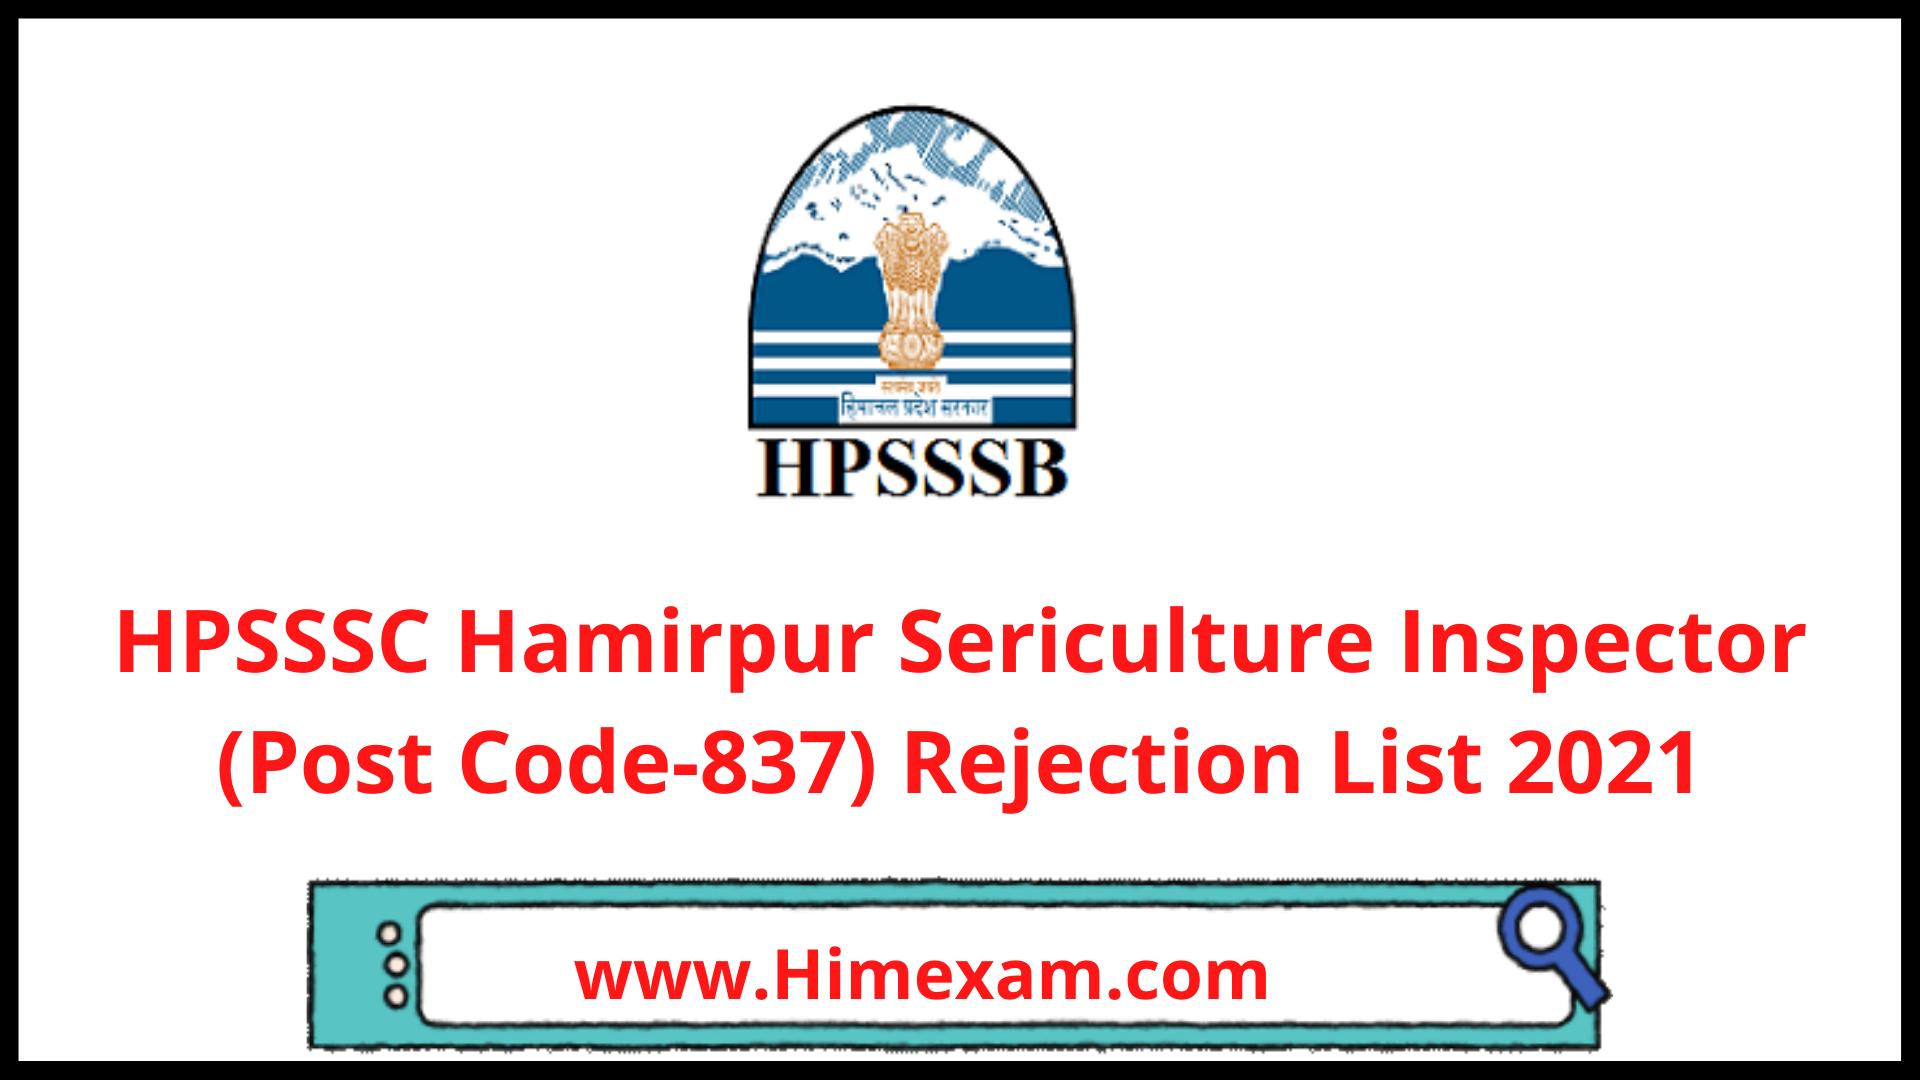 HPSSSC Hamirpur Sericulture Inspector (Post Code-837) Rejection List 2021